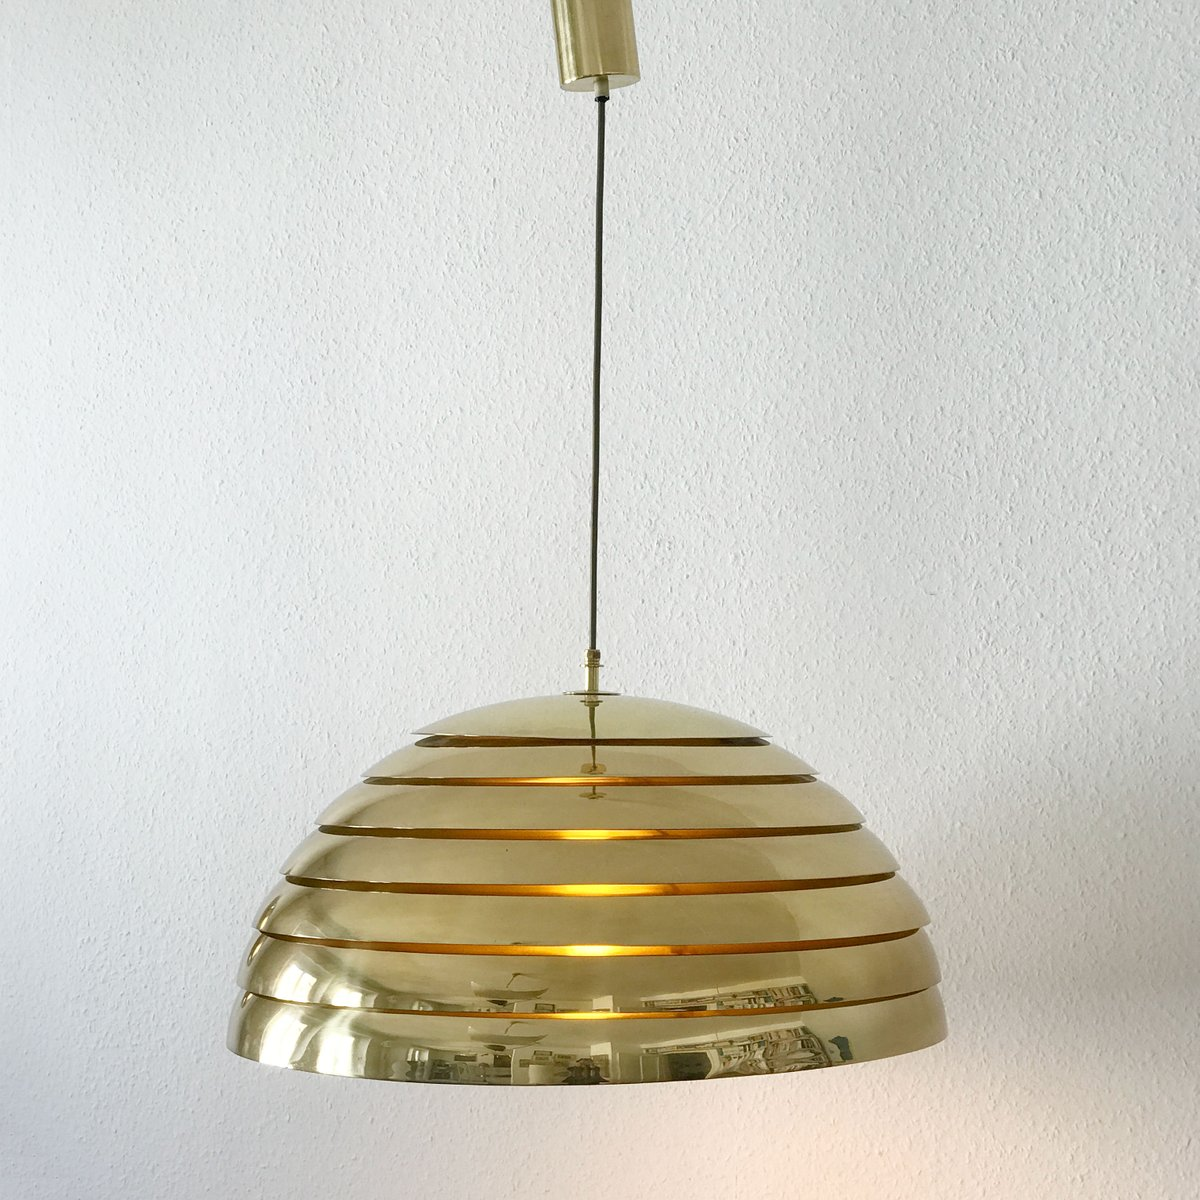 Large mid century modern brass dome pendant lamp from vereinigte large mid century modern brass dome pendant lamp from vereinigte werksttten collection aloadofball Gallery